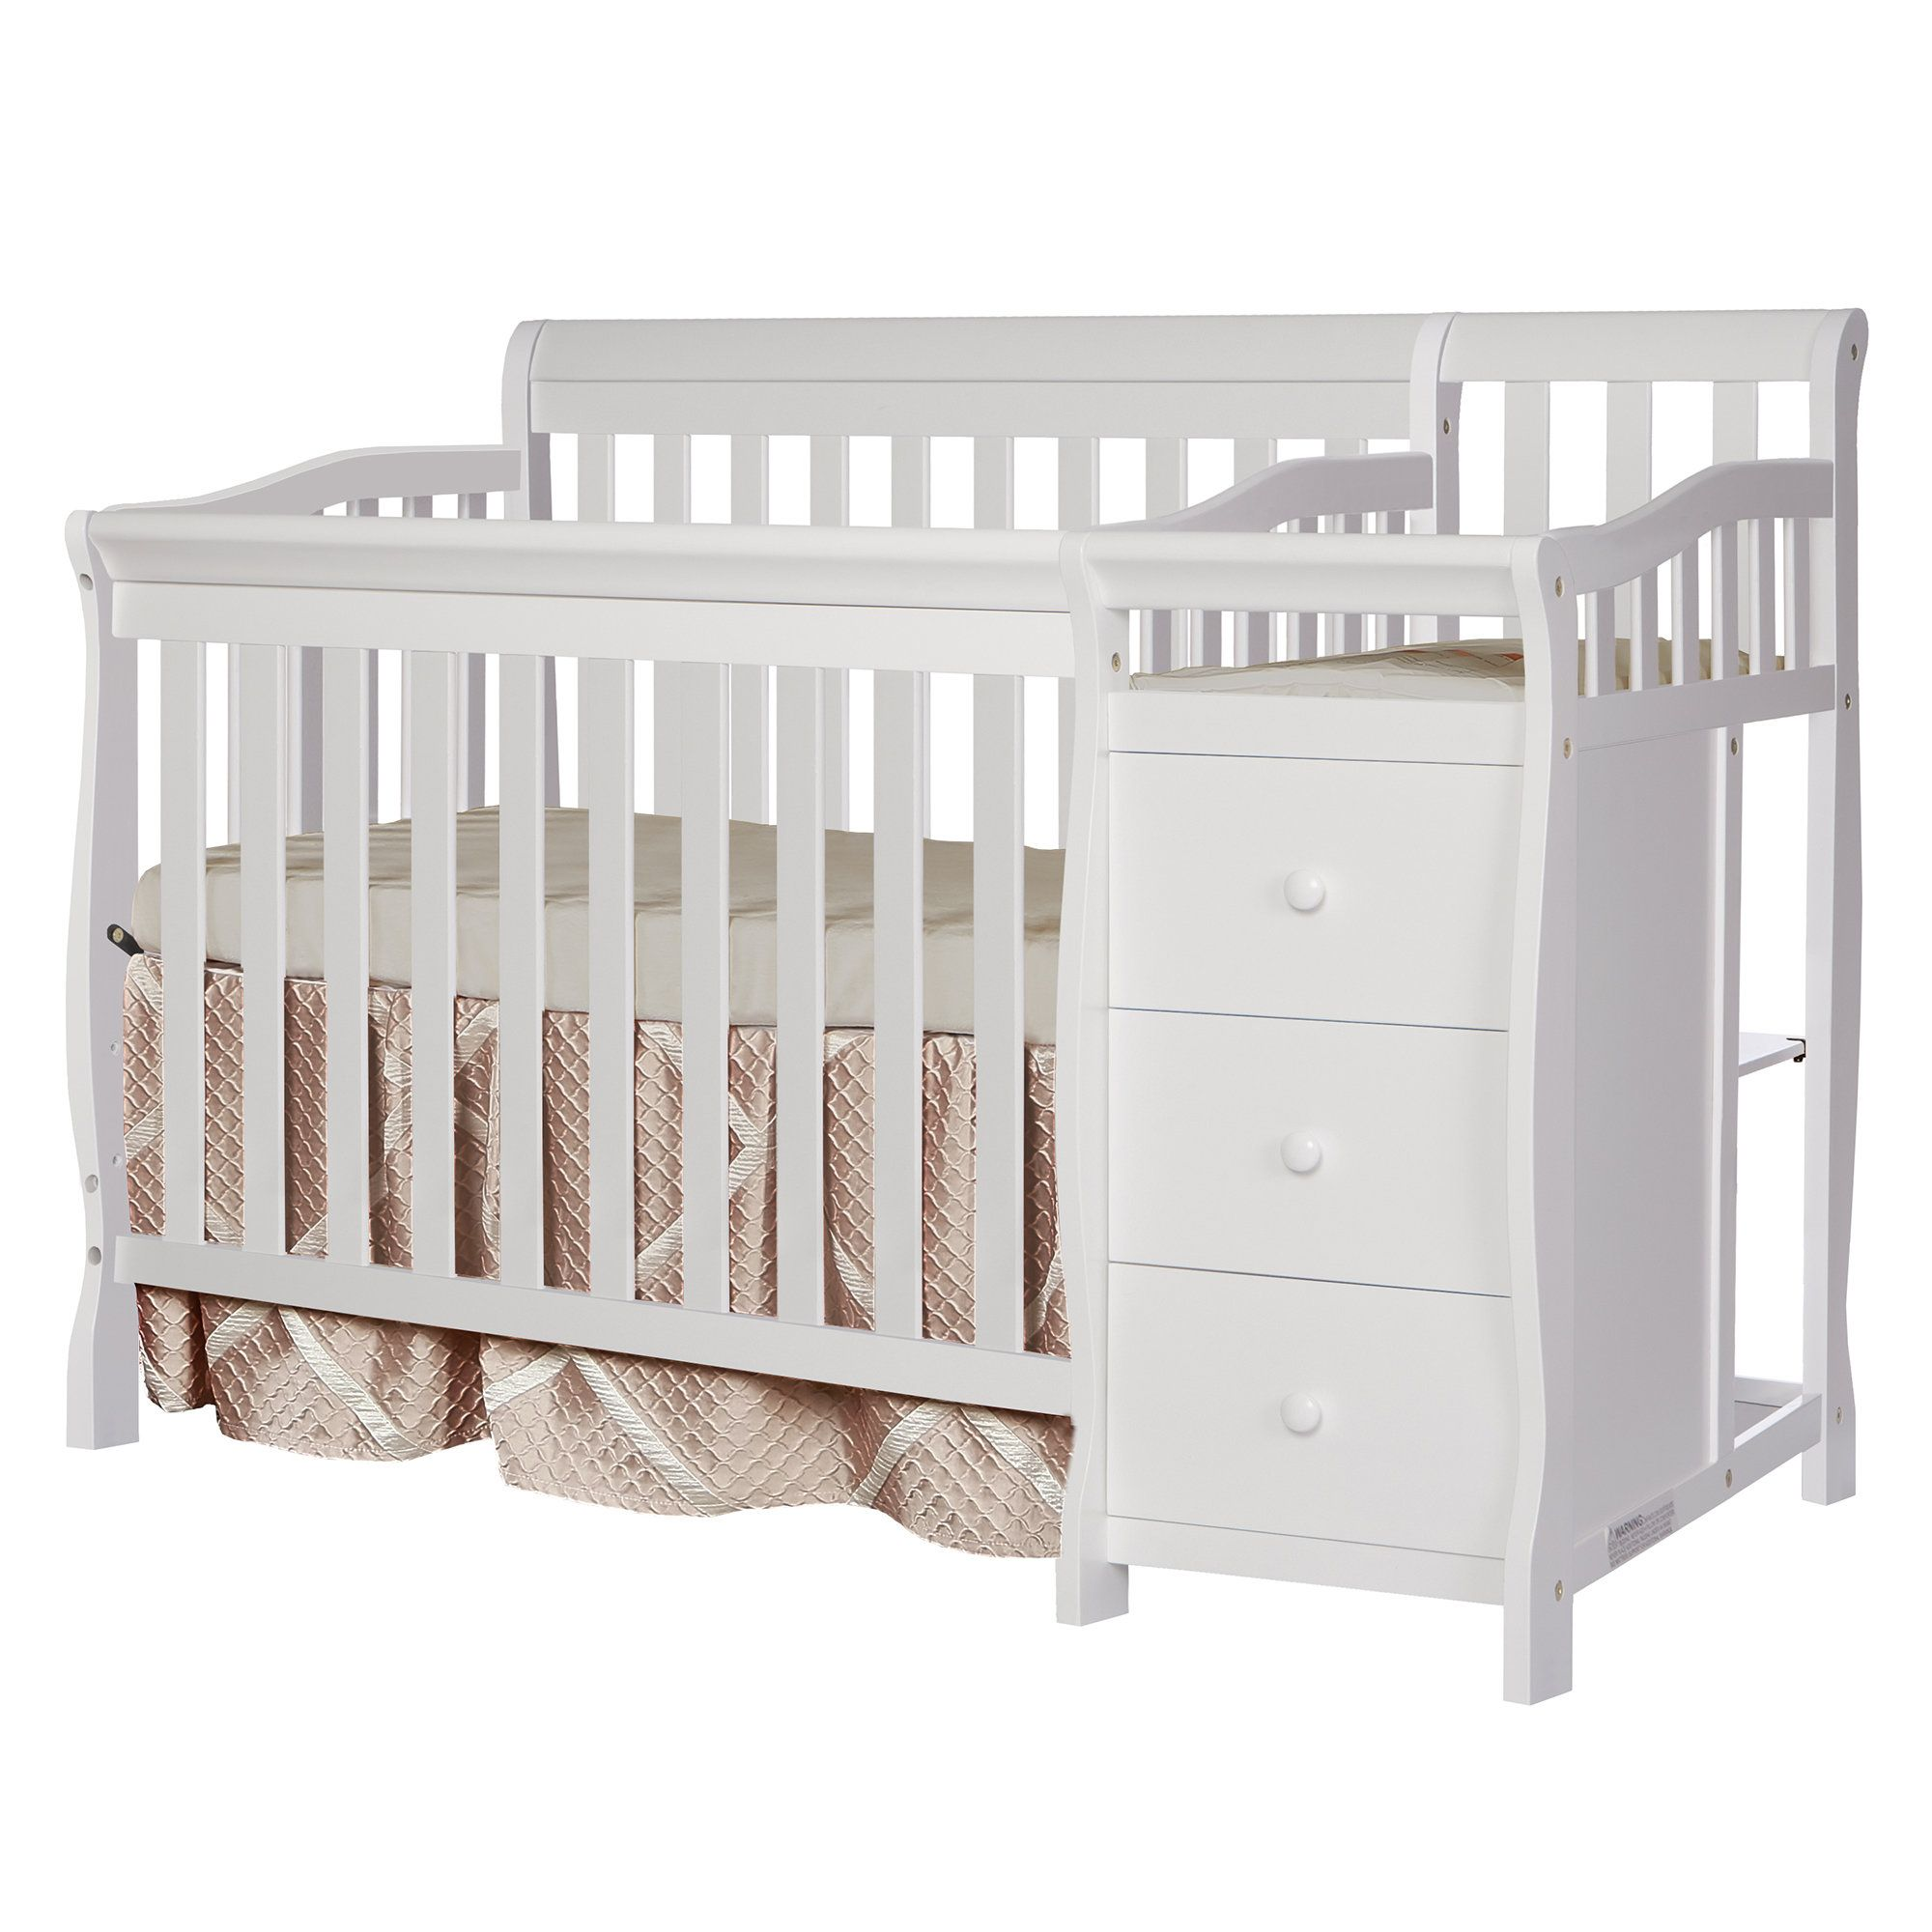 Jayden 3 In 1 Convertible Crib And Changer Cribs Convertible Crib Mini Crib